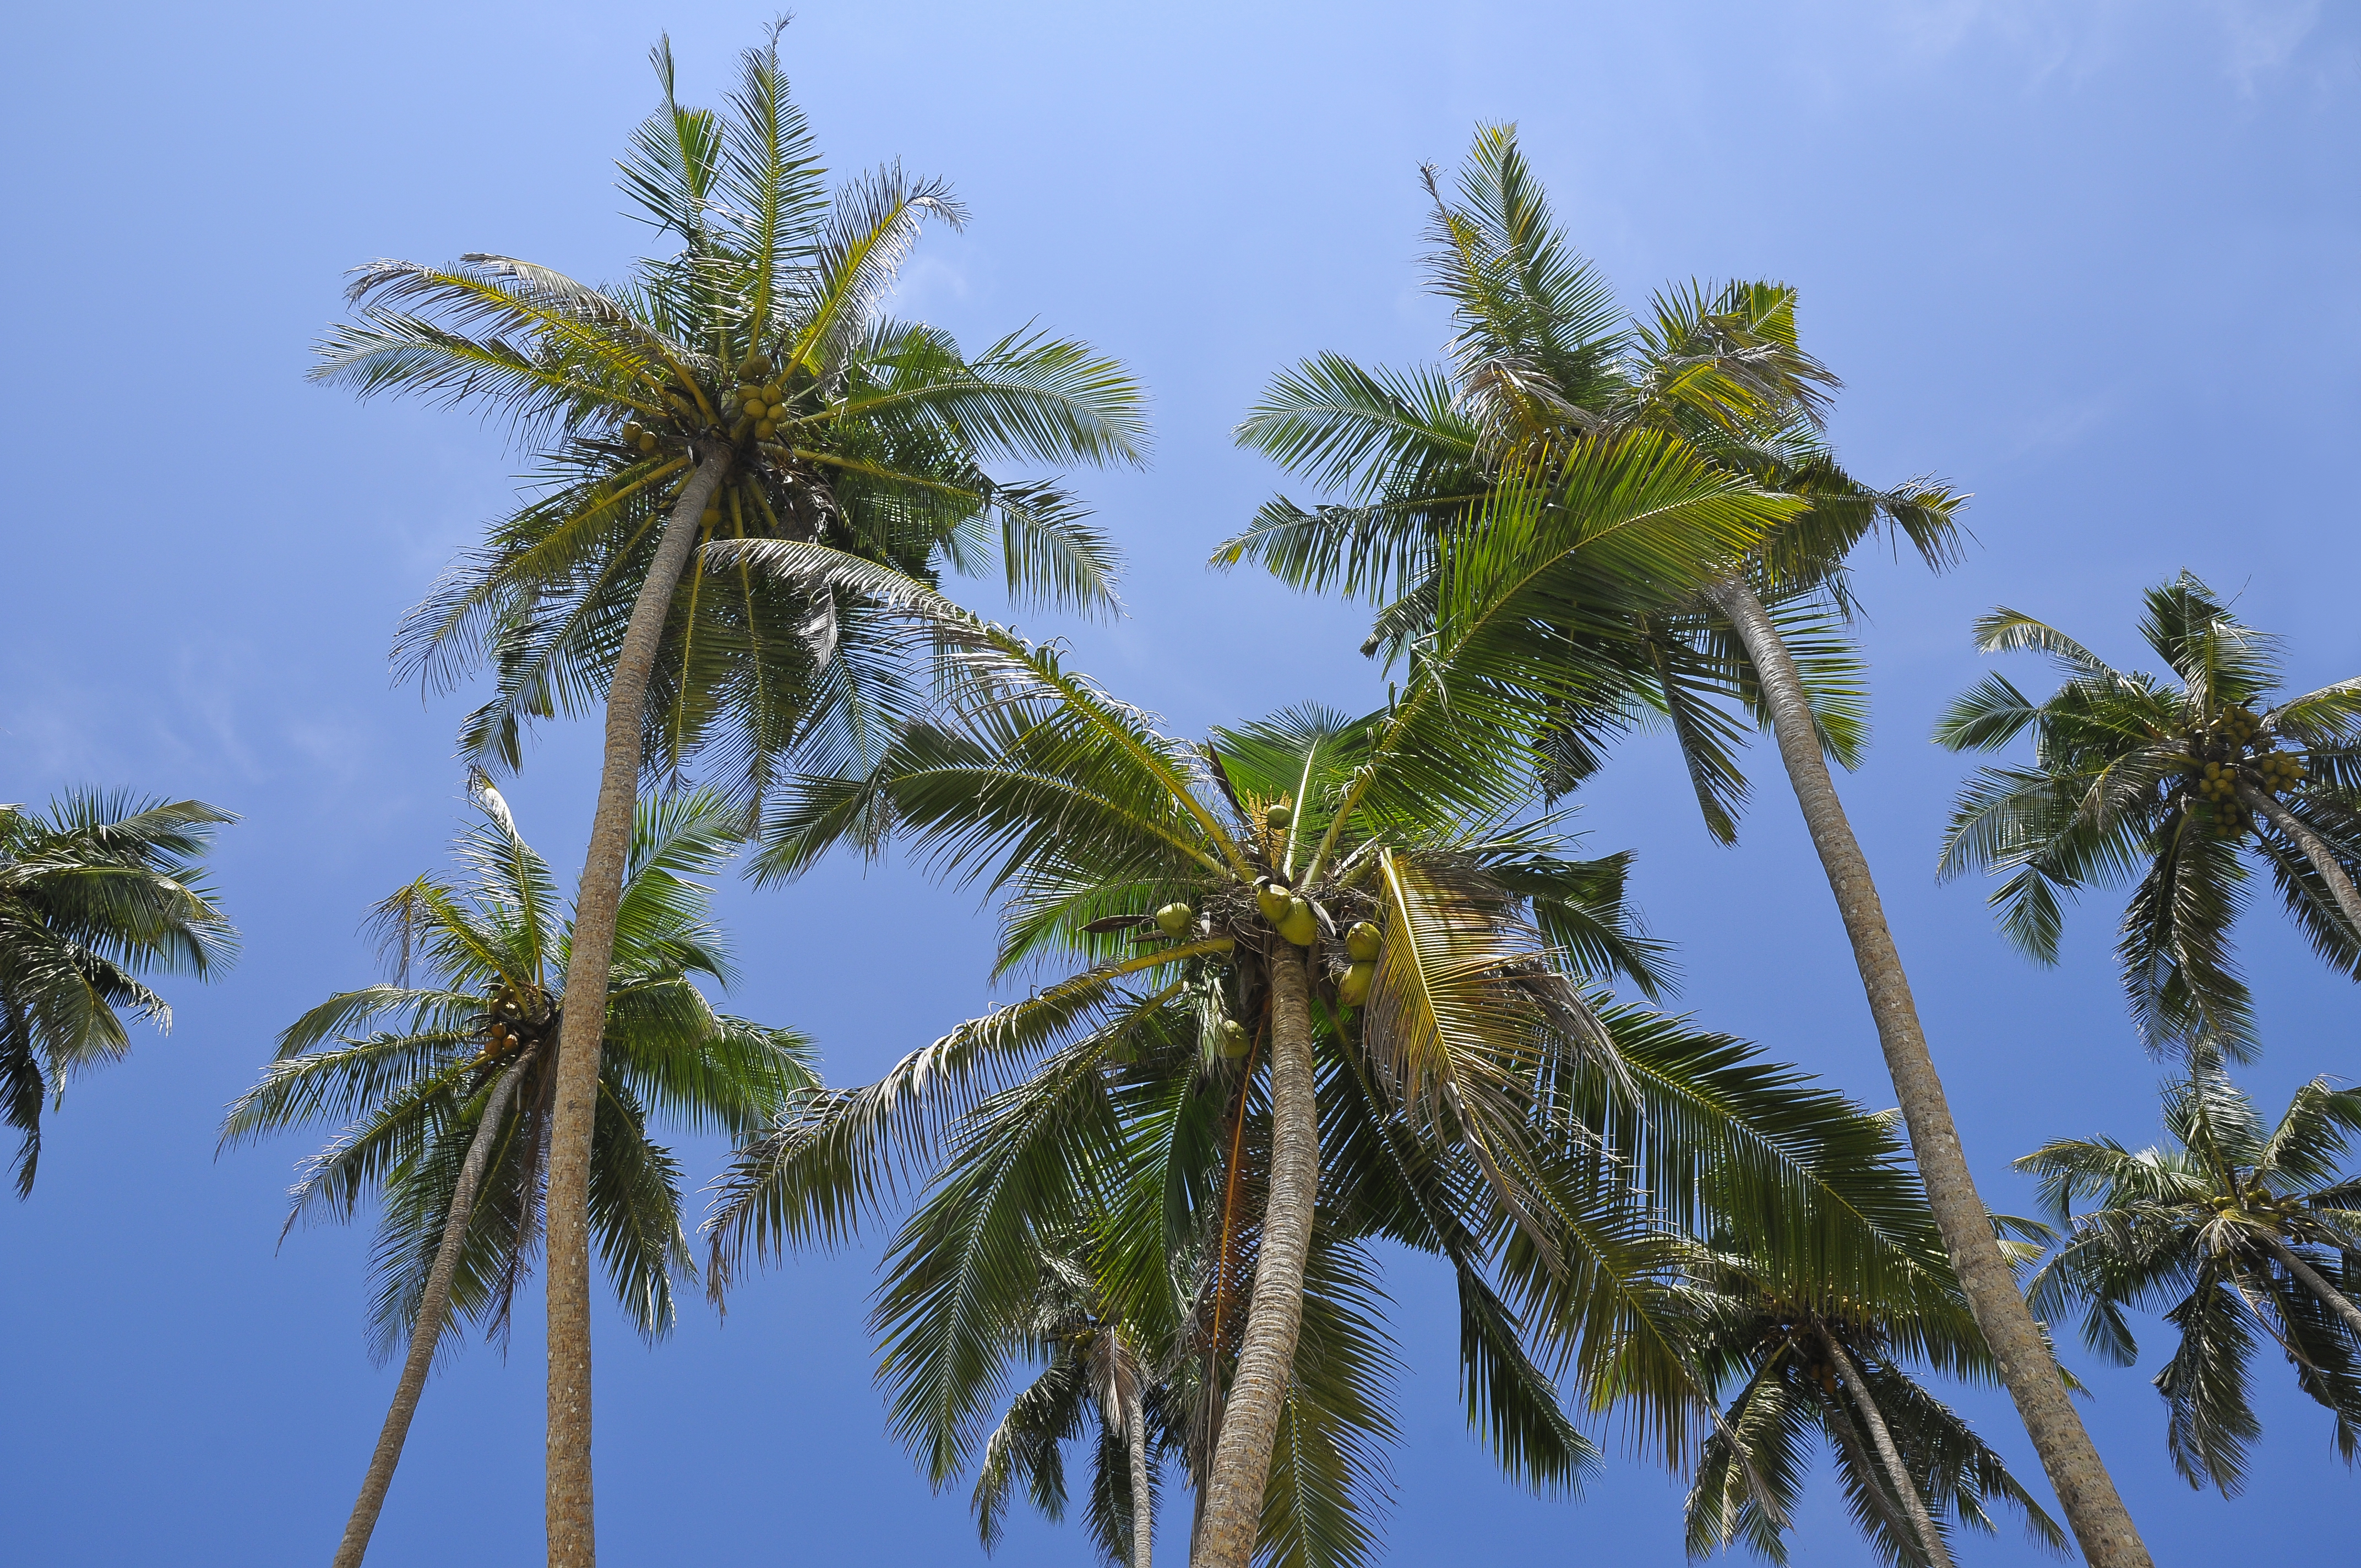 Description Of A Coconut Tree